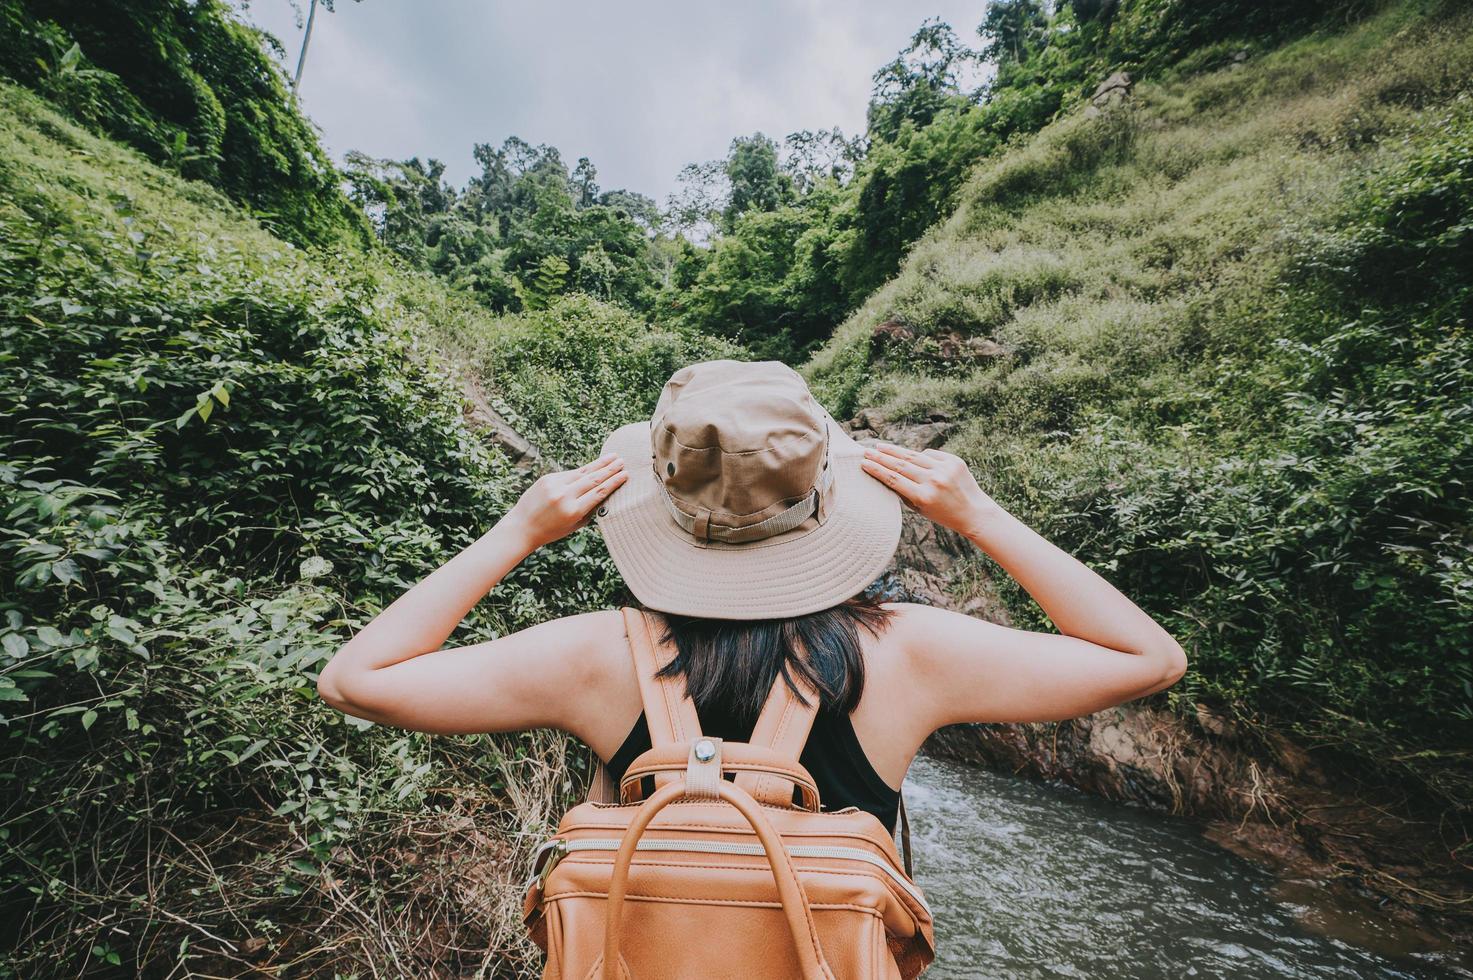 Woman enjoying nature on a hike photo